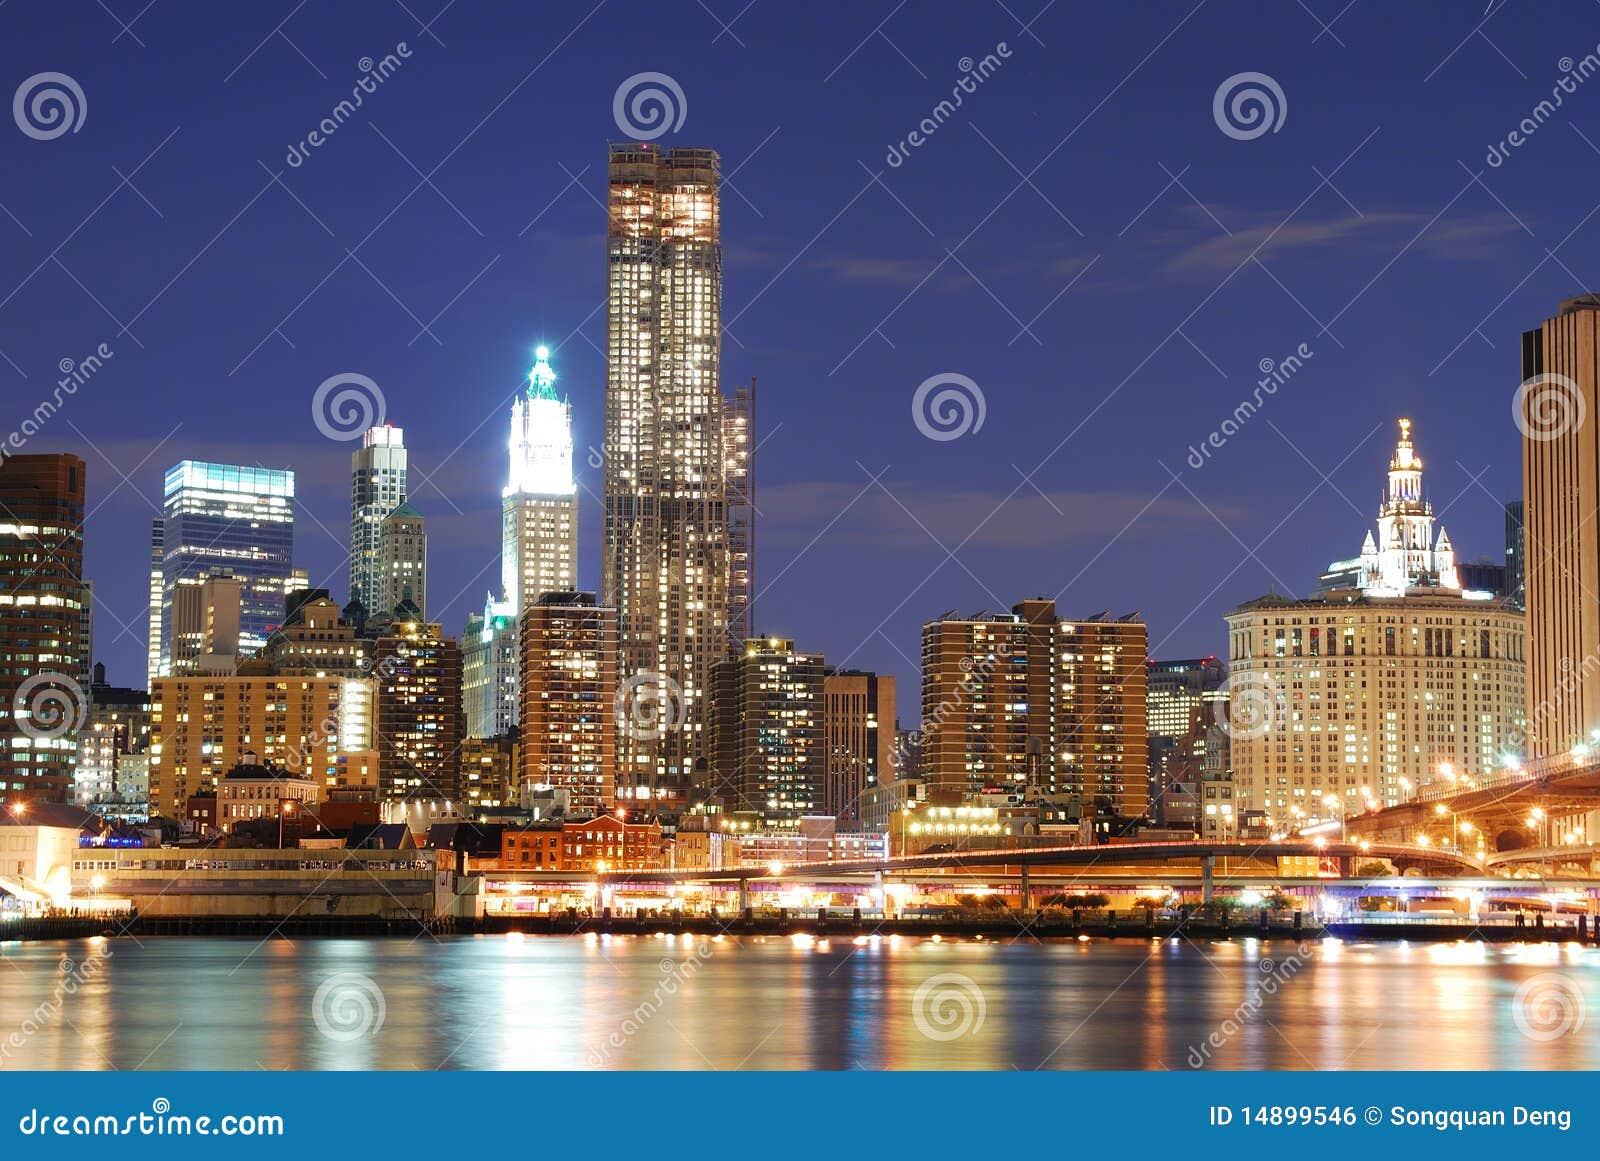 modern new york city skyline royalty free stock image image 14899546